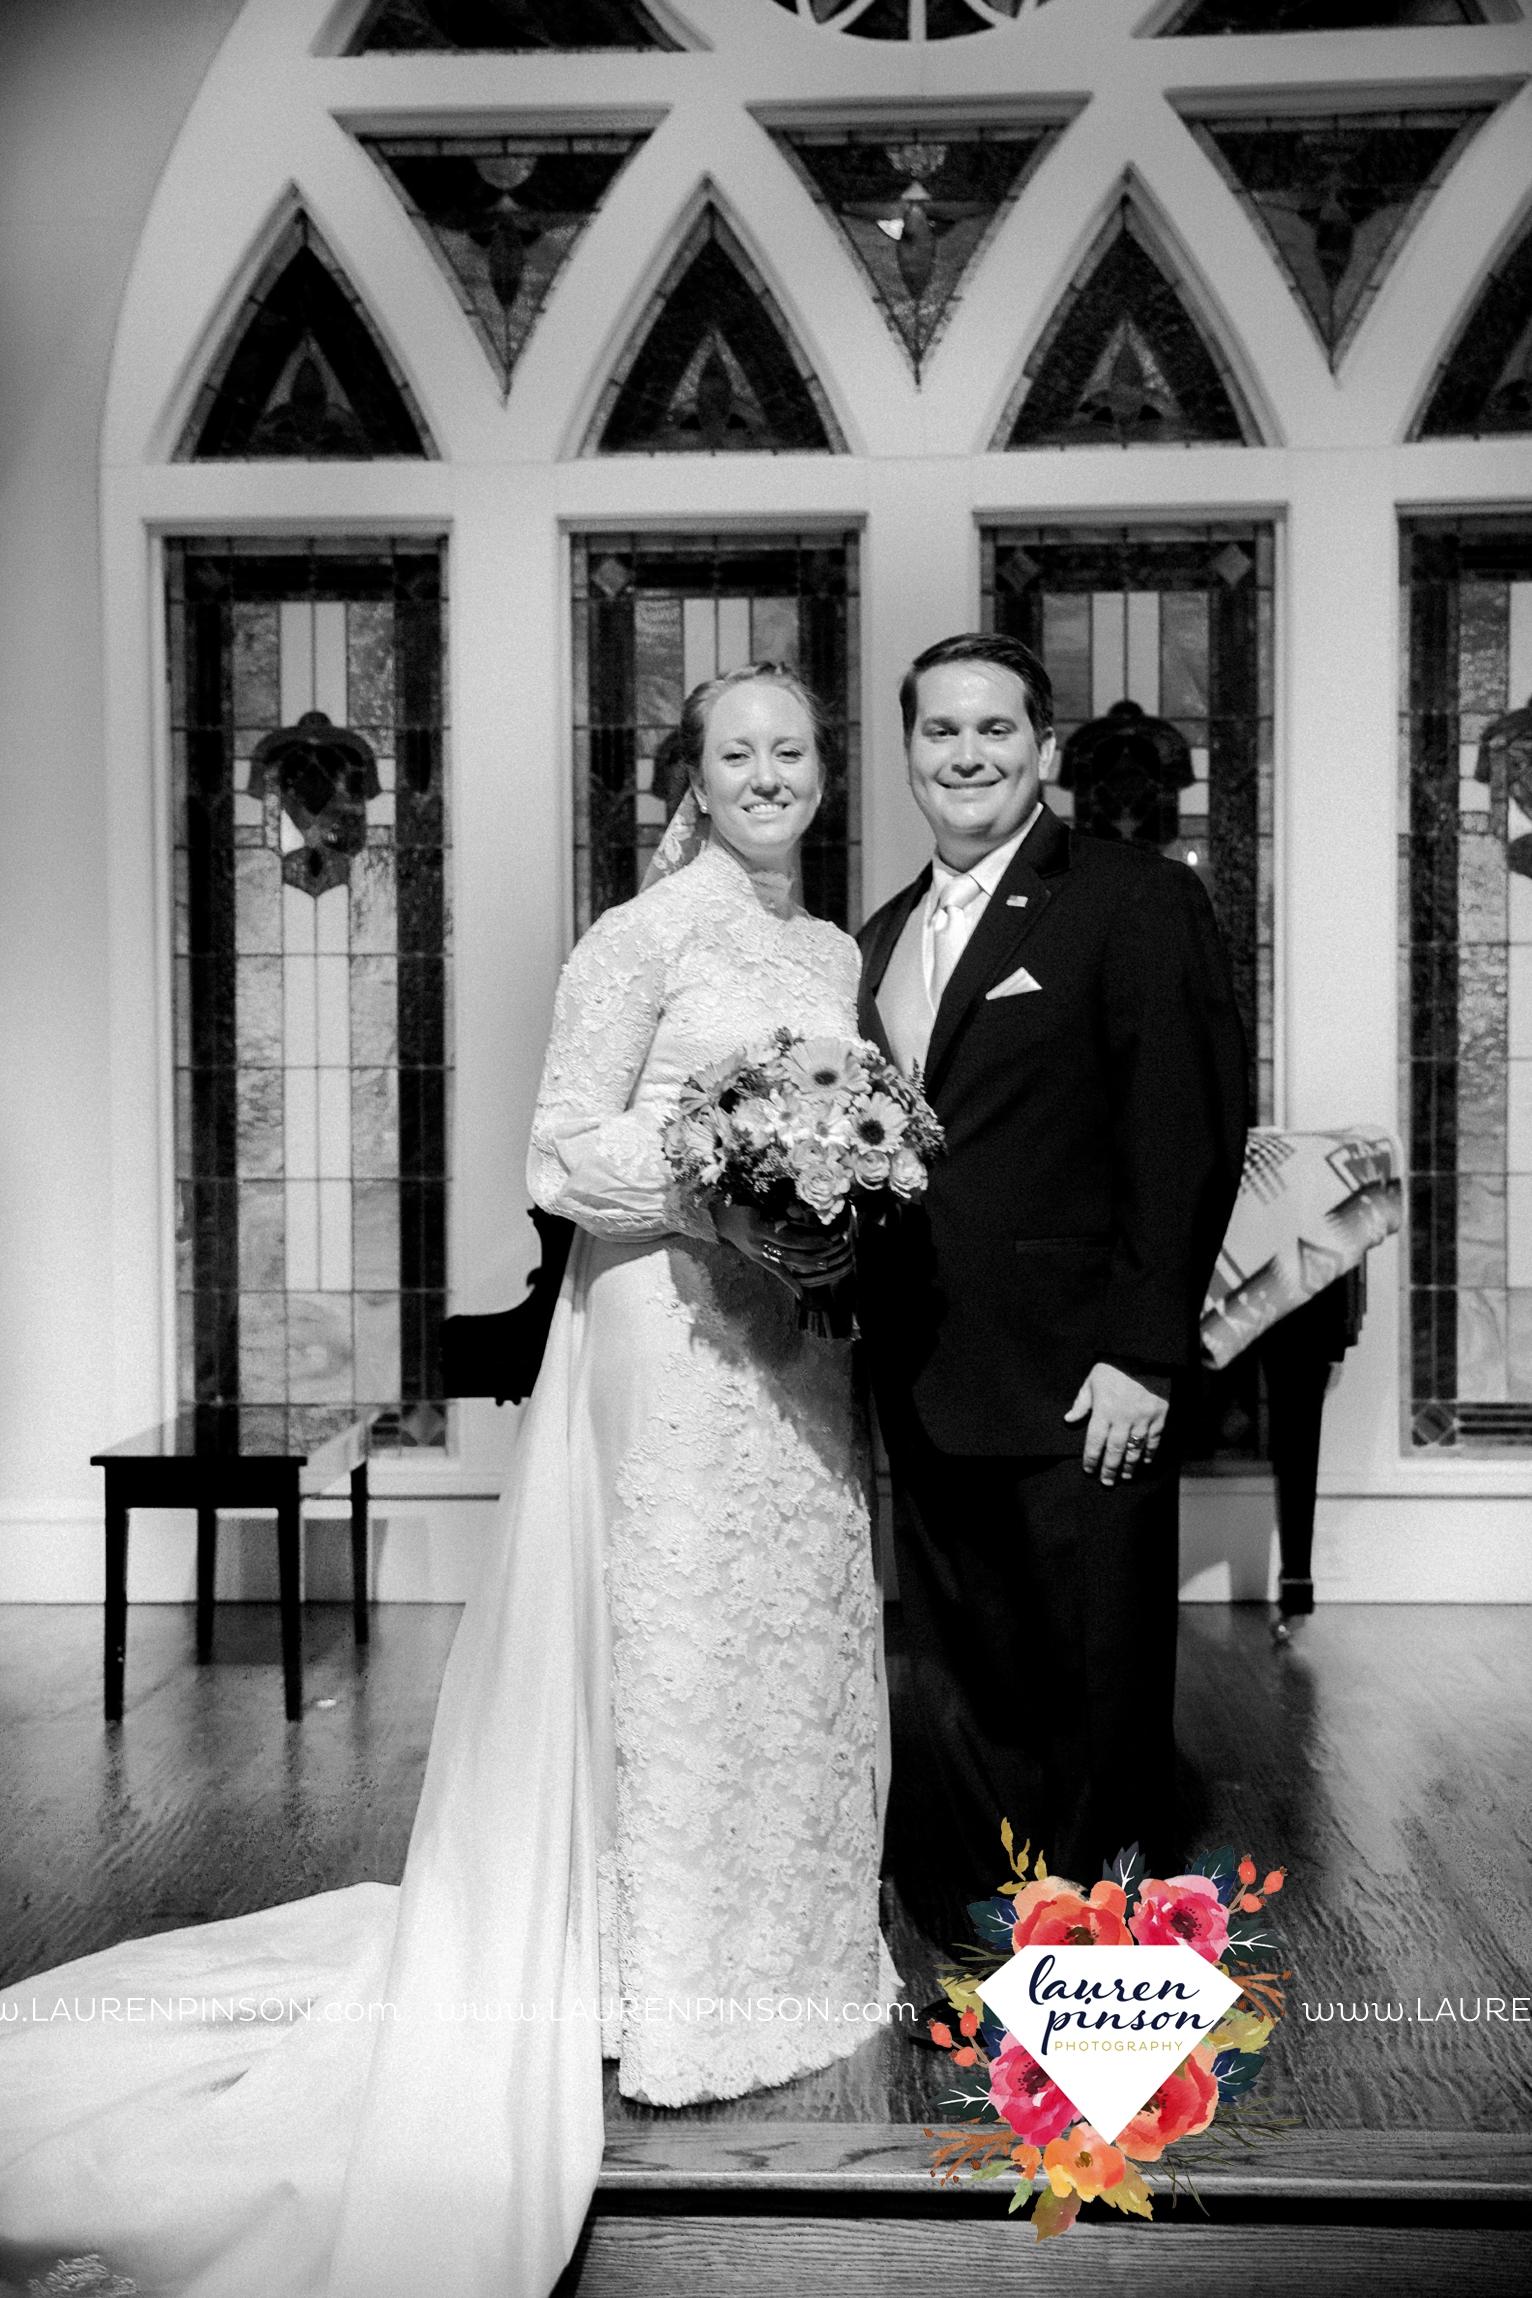 bells-texas-wedding-photography-at-willowood-ranch-chapel-north-texas-wichita-falls-wedding-photographer_1880.jpg